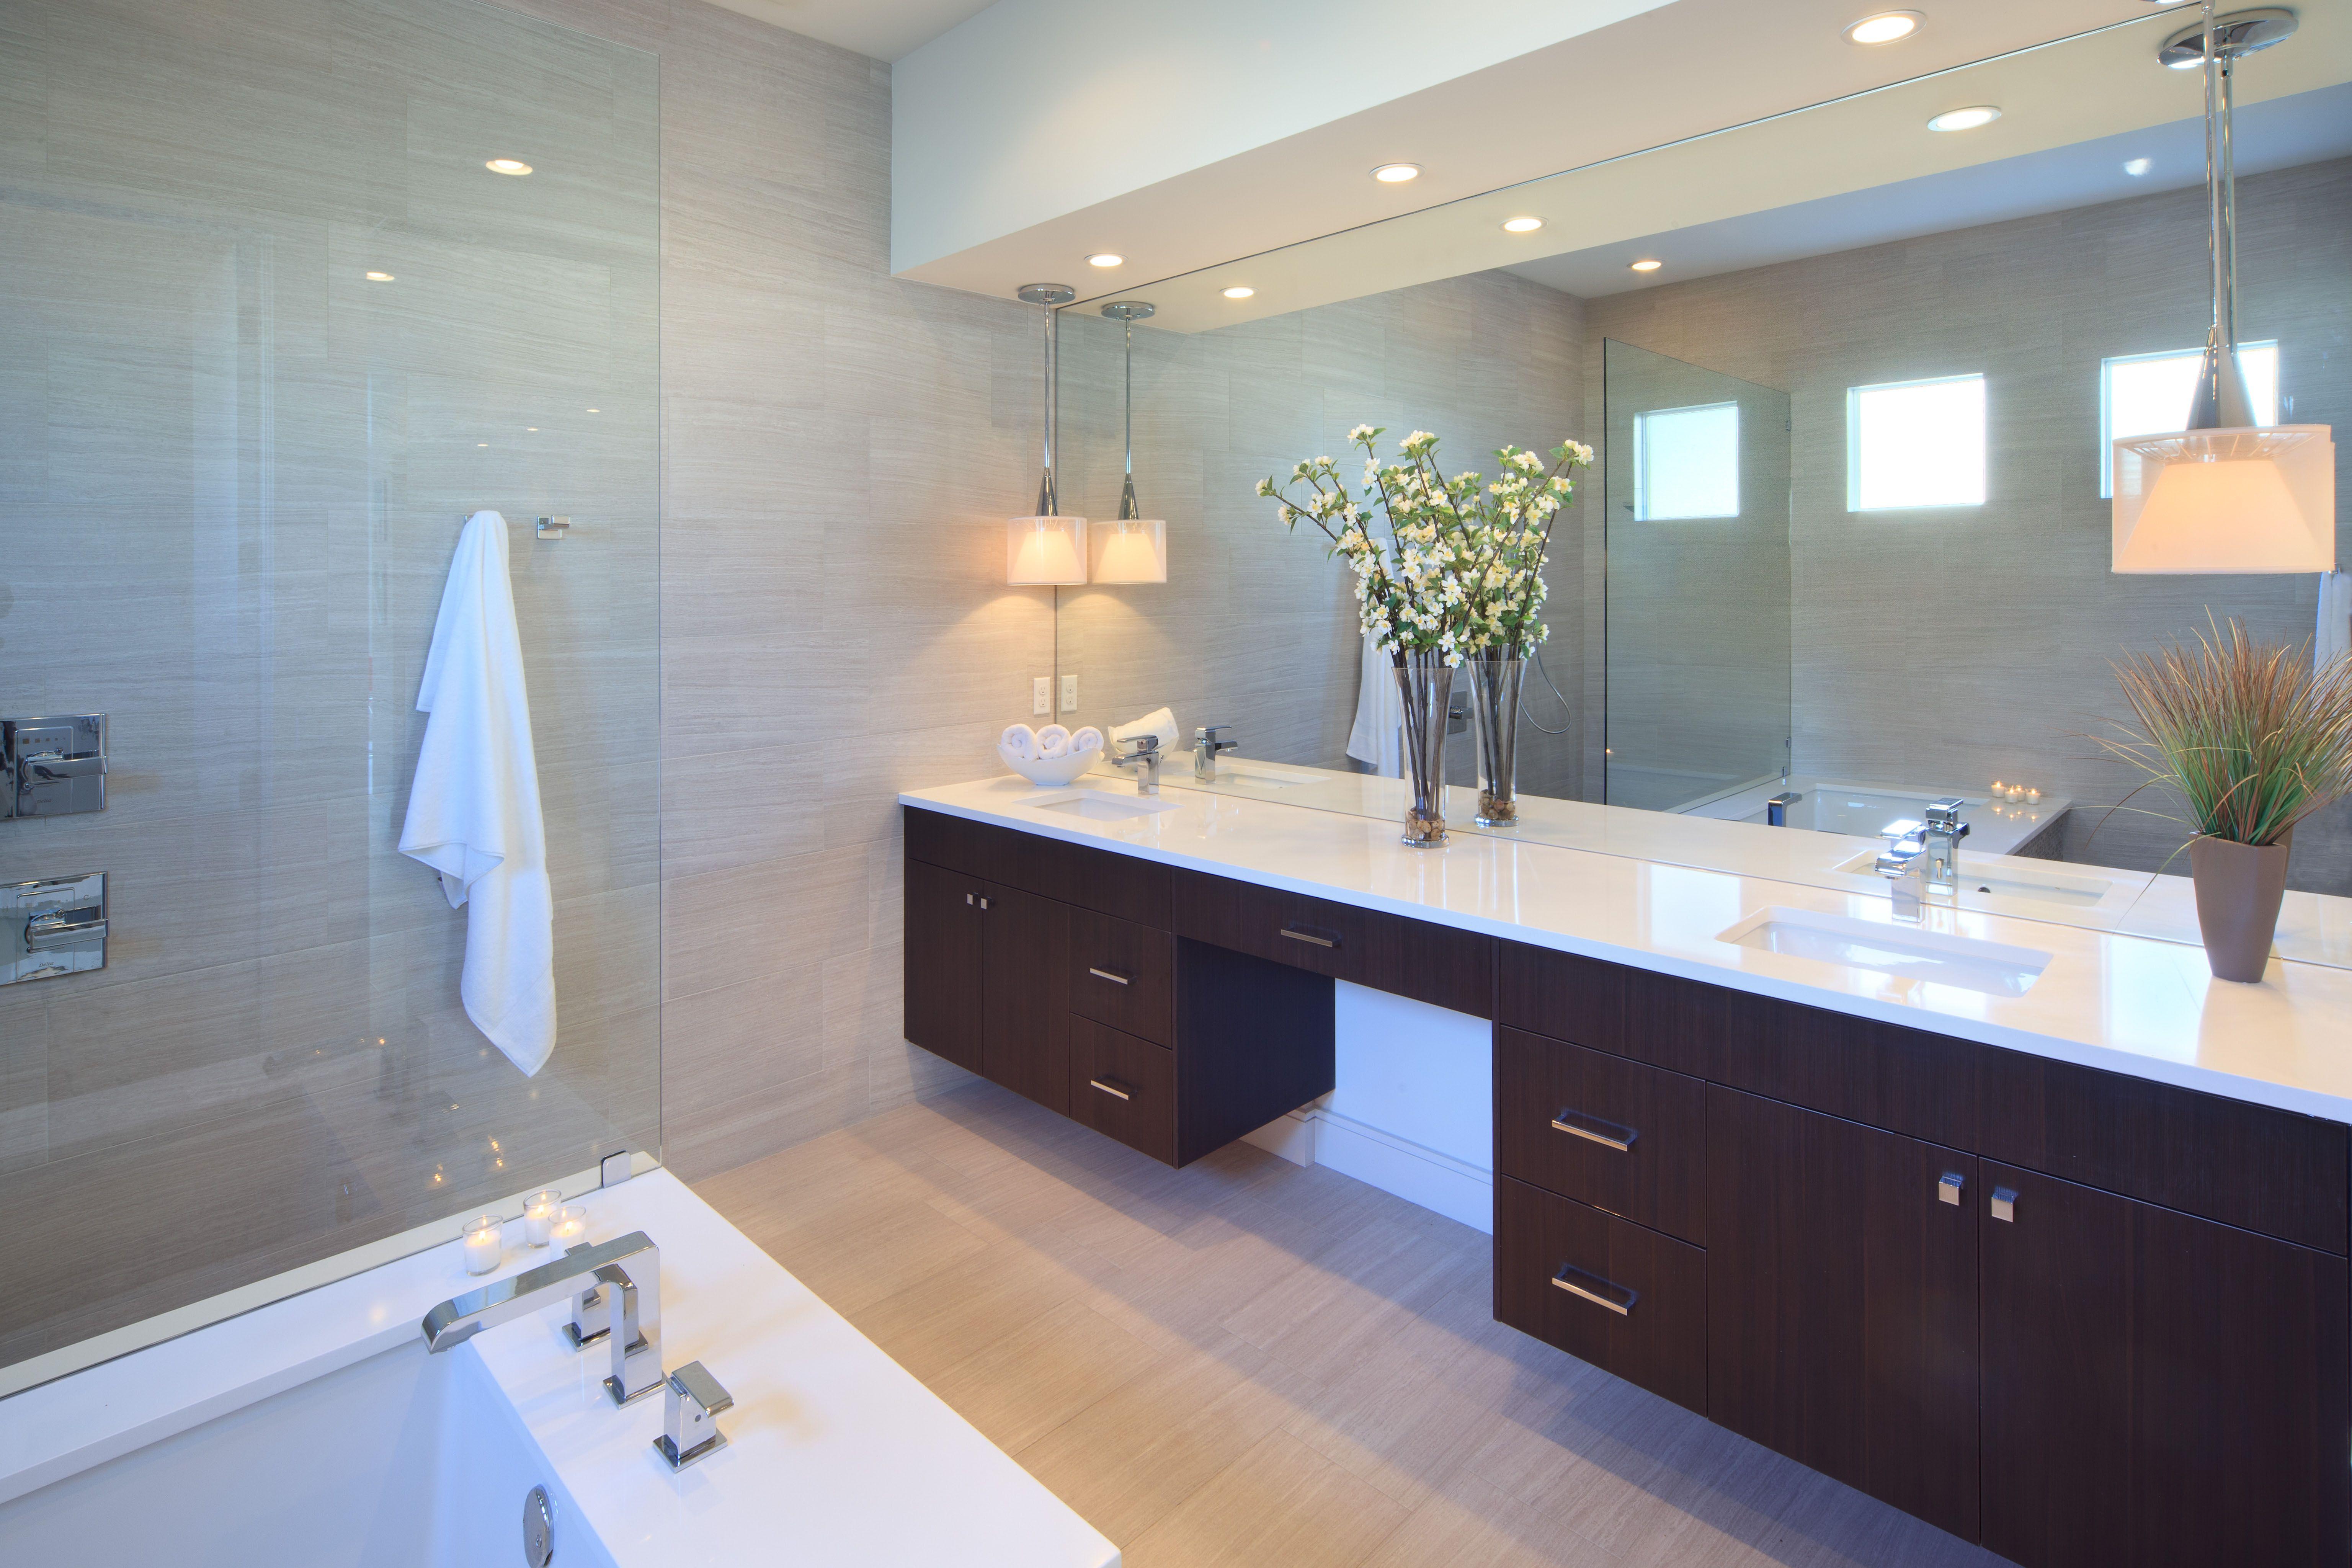 vanity in master bath with images lighted bathroom on custom bathroom vanity mirrors id=34390